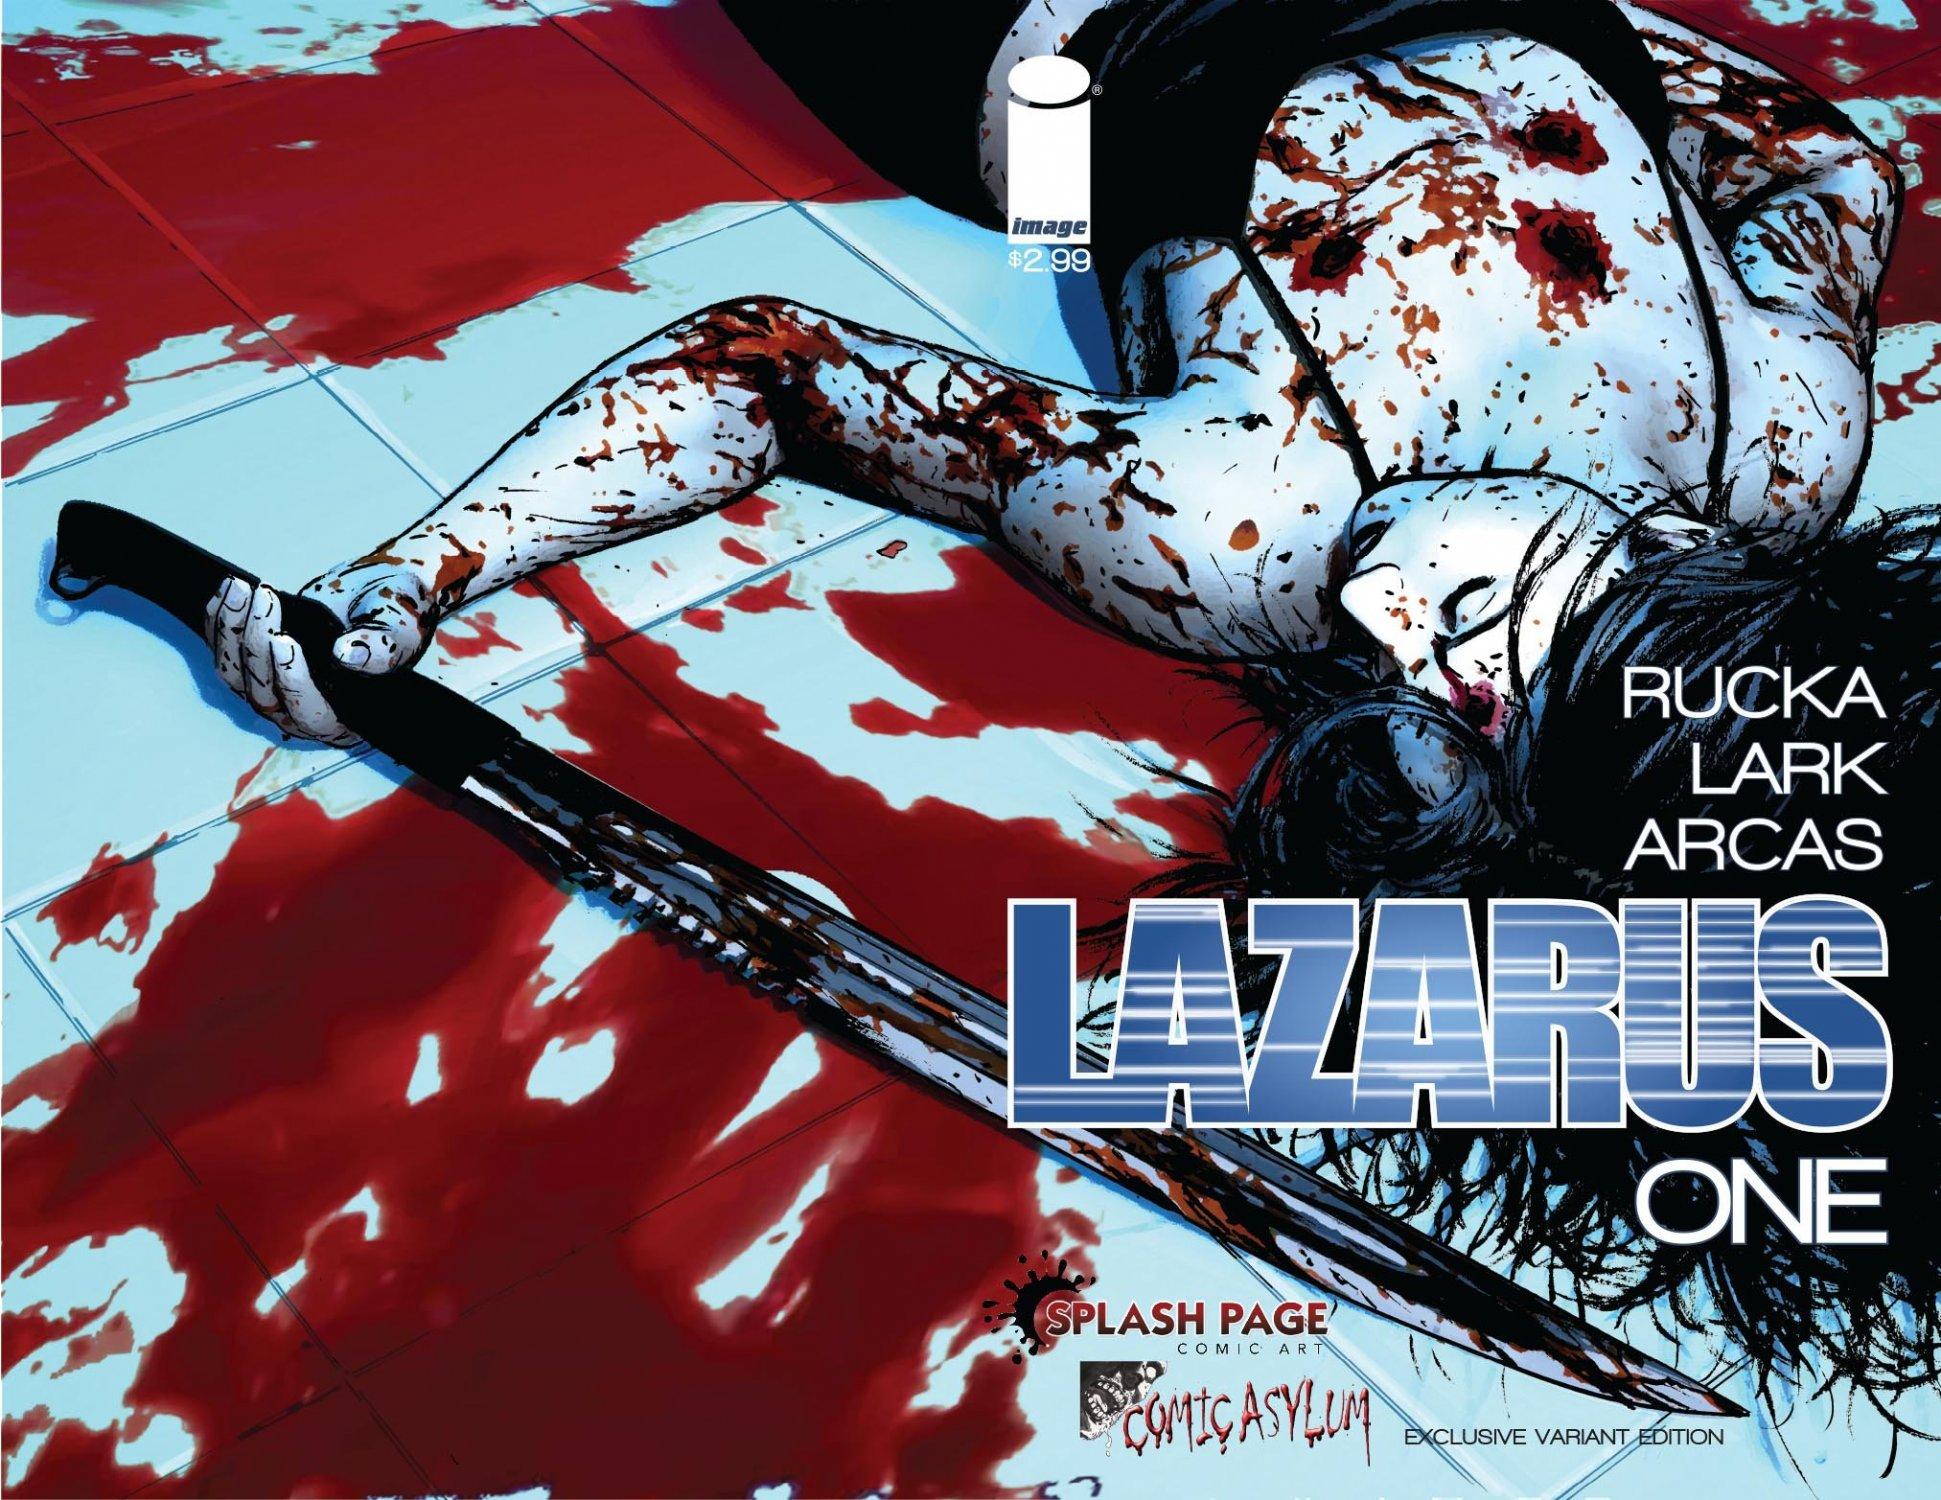 Lazarus Splash Page Comic Art & Comic Asylum Retailer Variant Comic Book